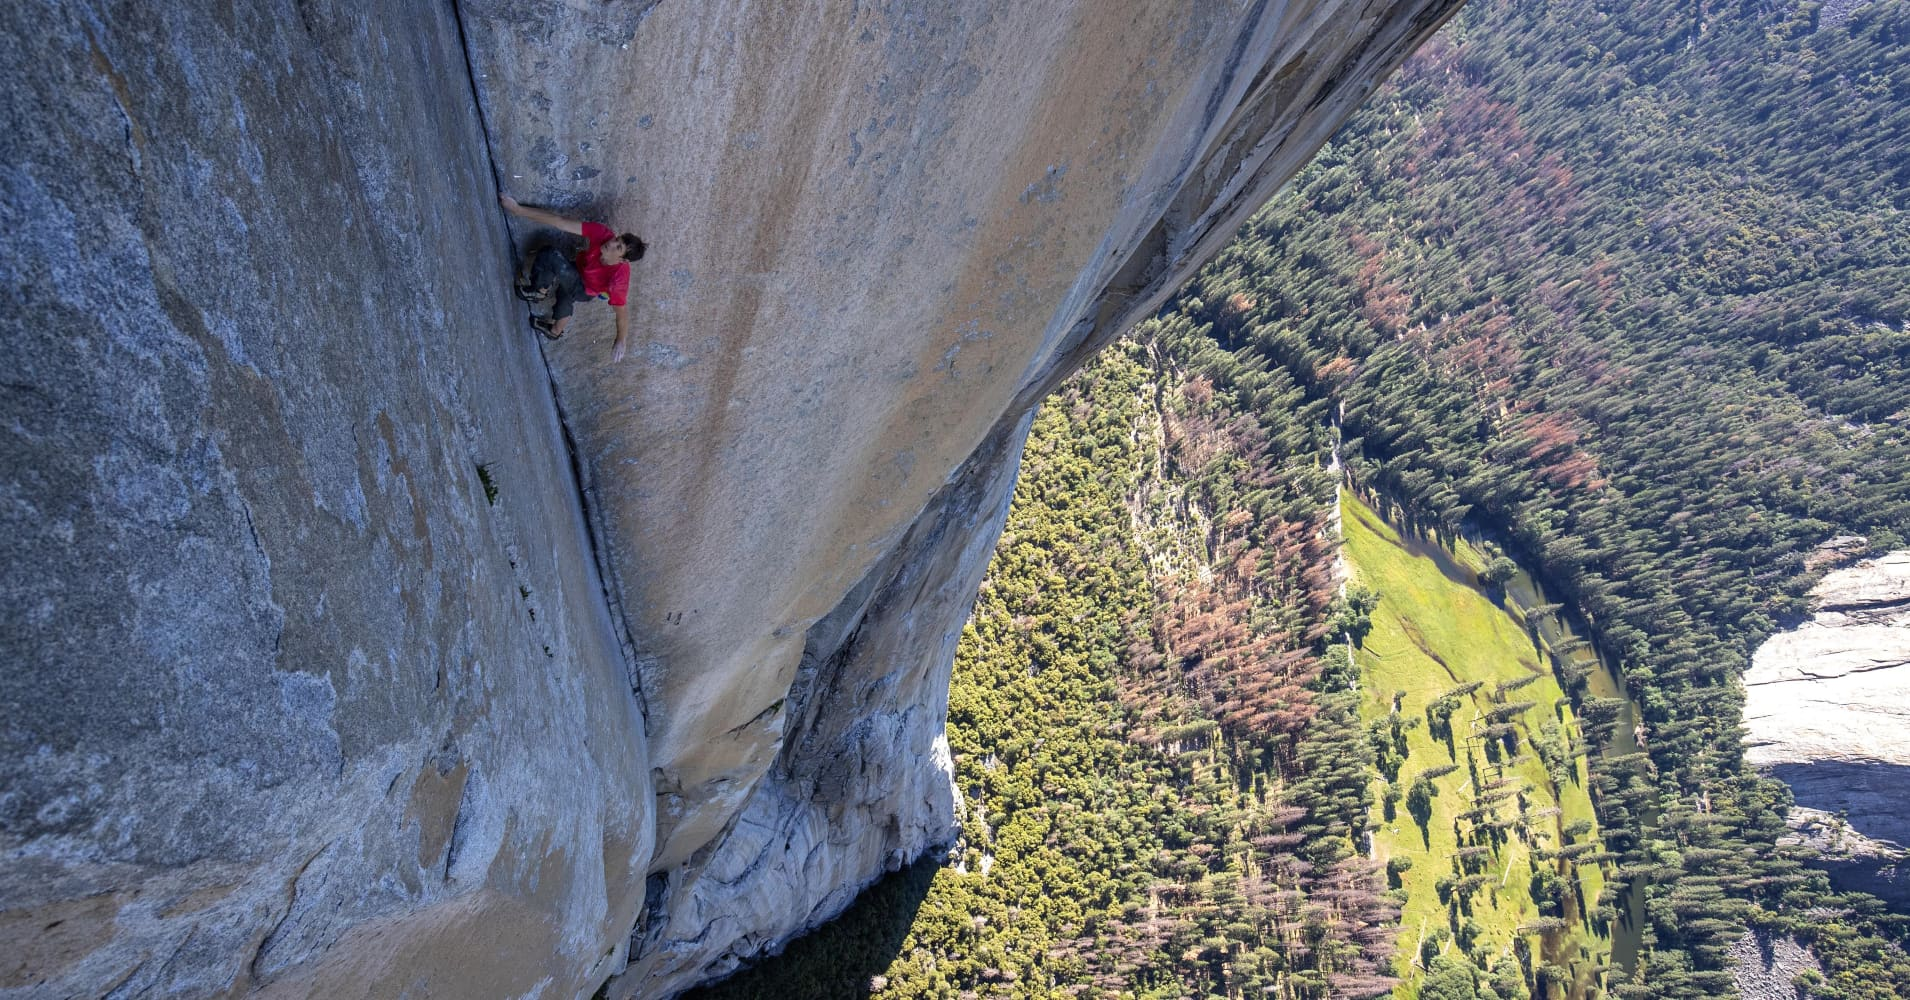 Alex Honnold ascends El Capitan in Yosemite Valley in 2019's Oscar-winning documentary film 'Free Solo.'